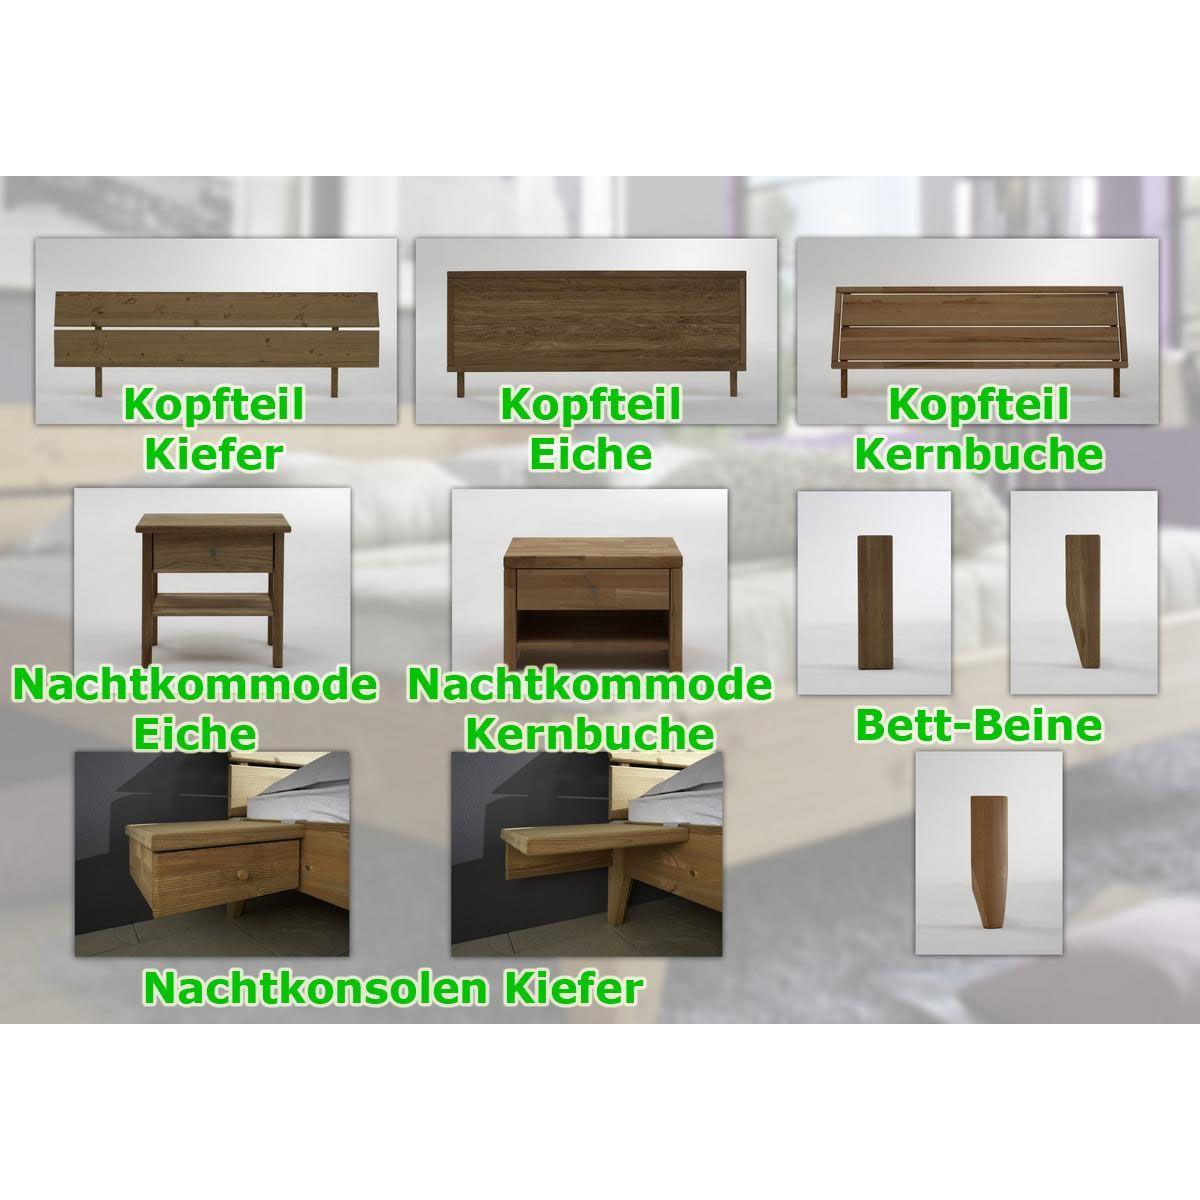 massivholz schubladenbett 180x200 holzbett bett kiefer massiv, Schlafzimmer design